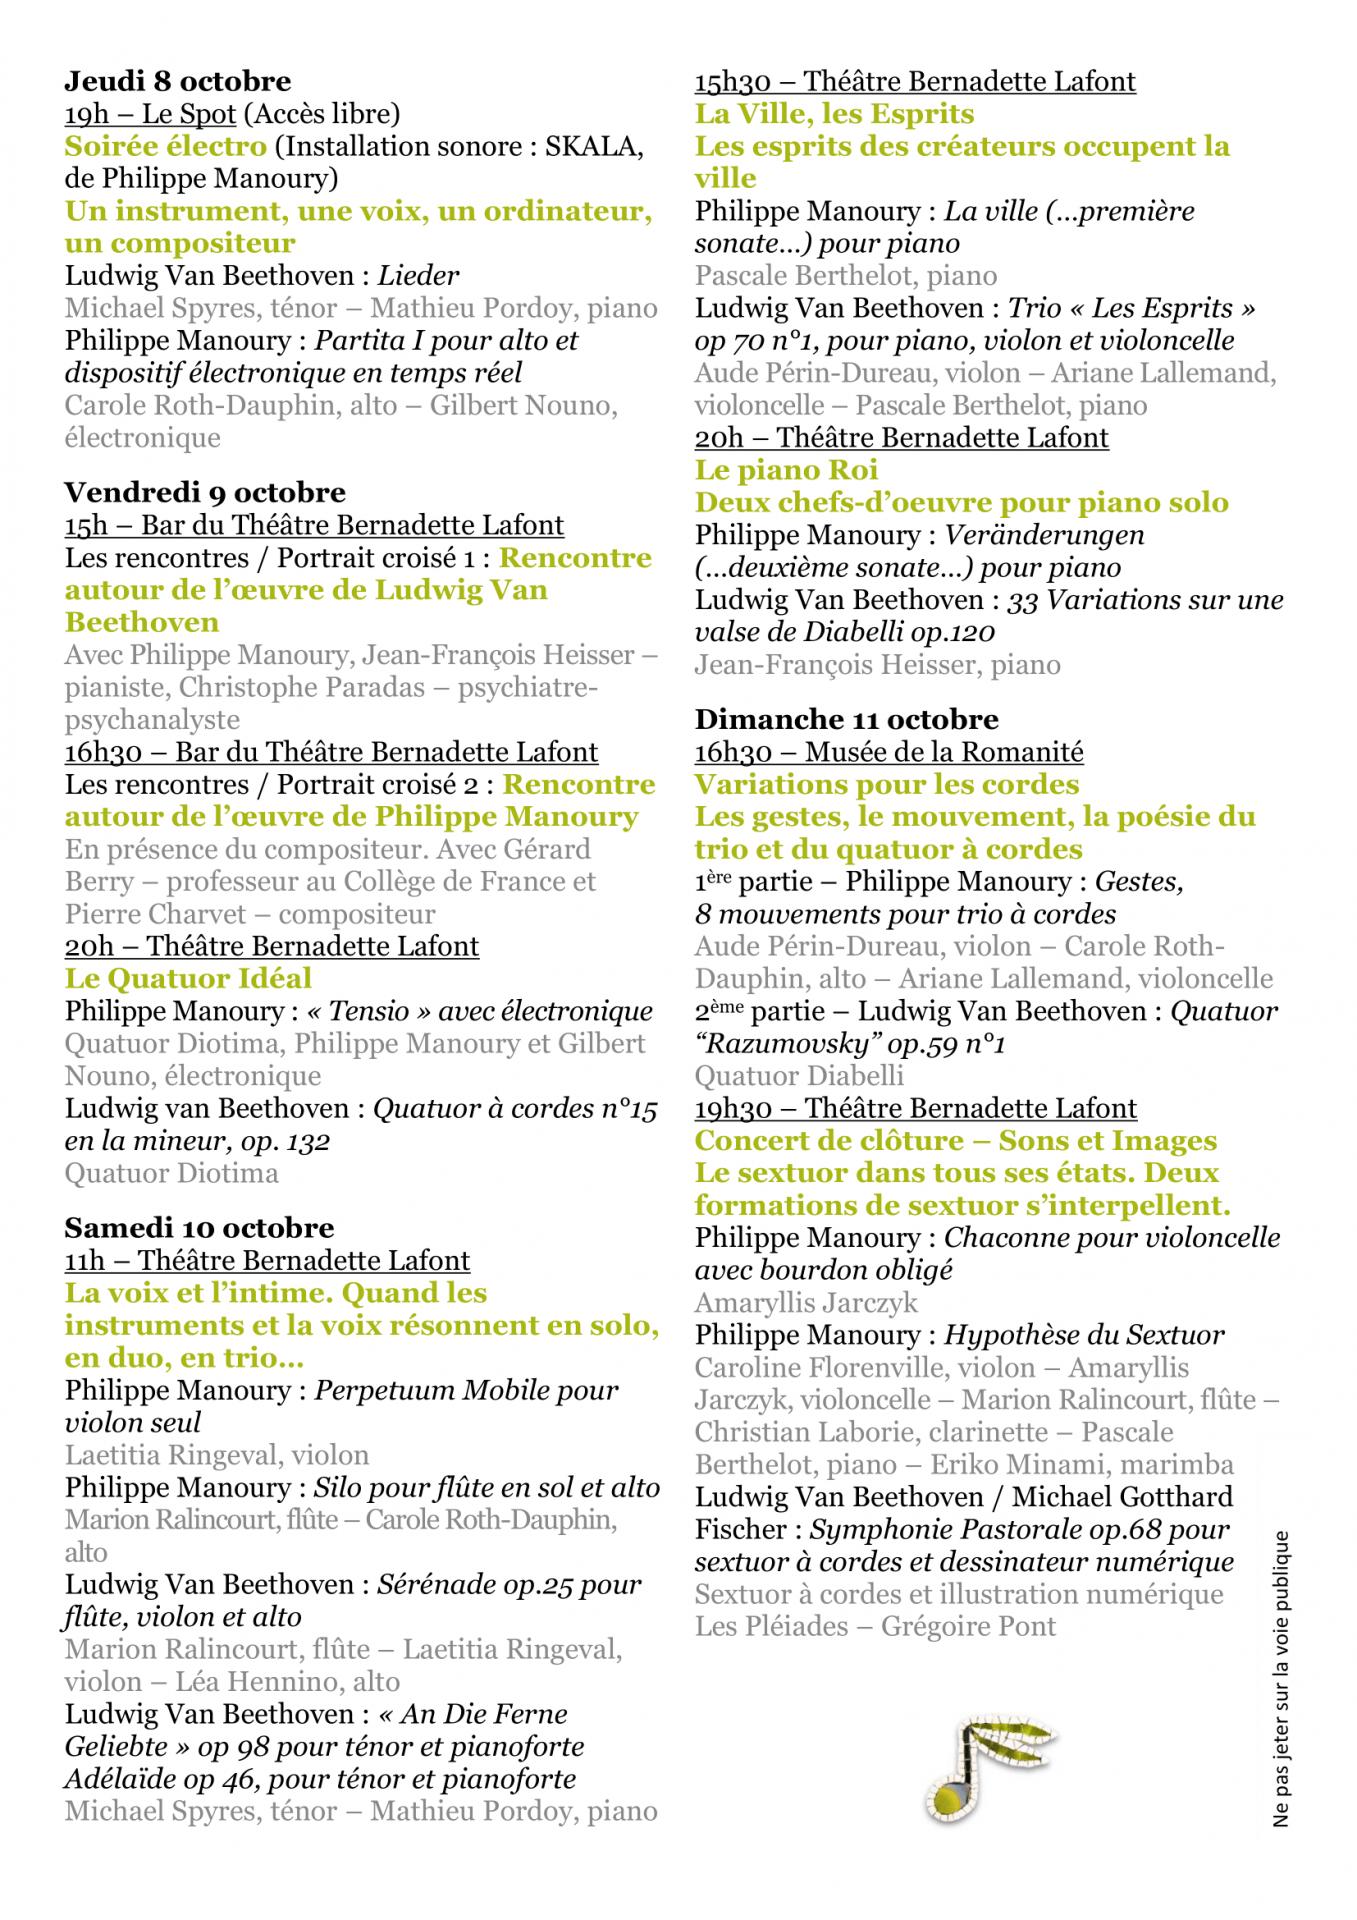 Festival volques flyer 2